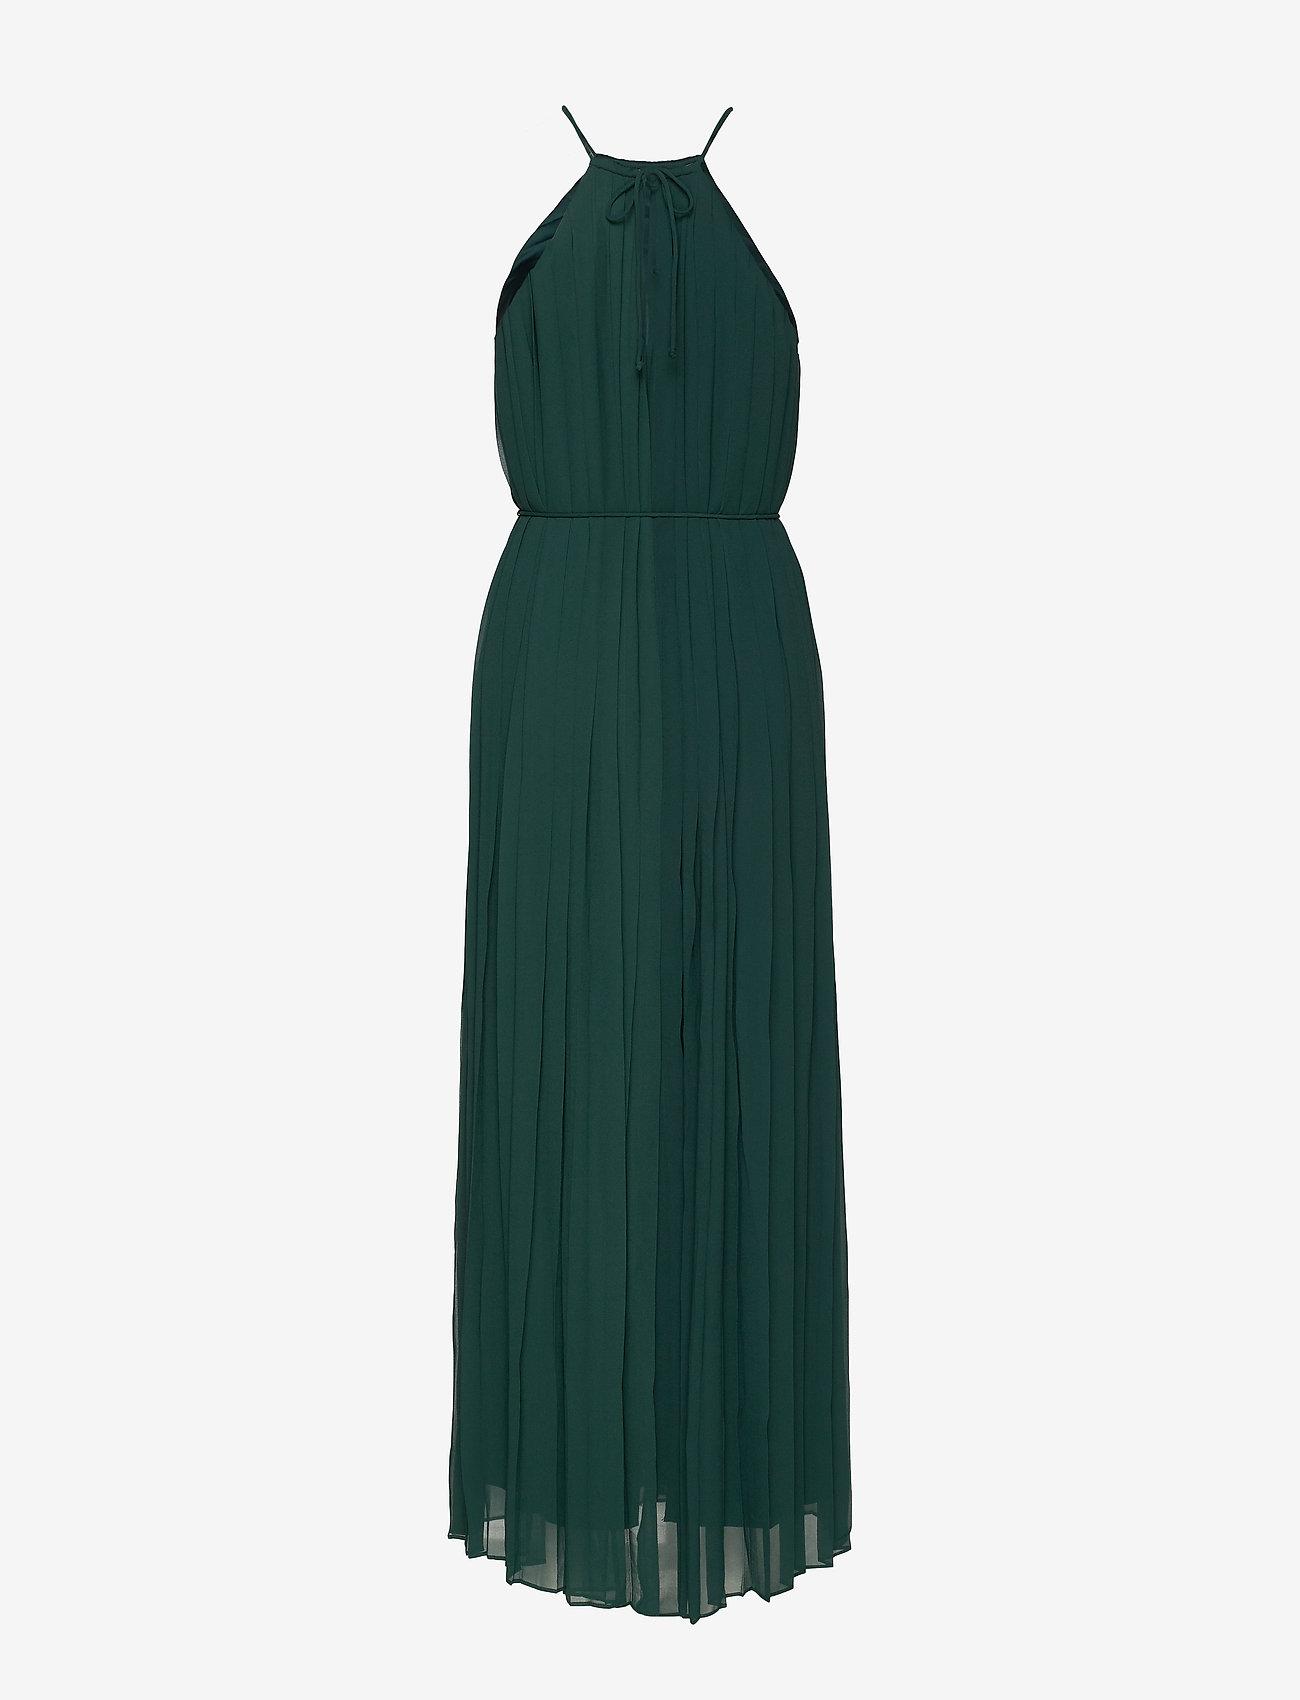 Amber Long Dress 11185 (Sea Moss) (149 €) - Samsøe Samsøe vQ4Ld